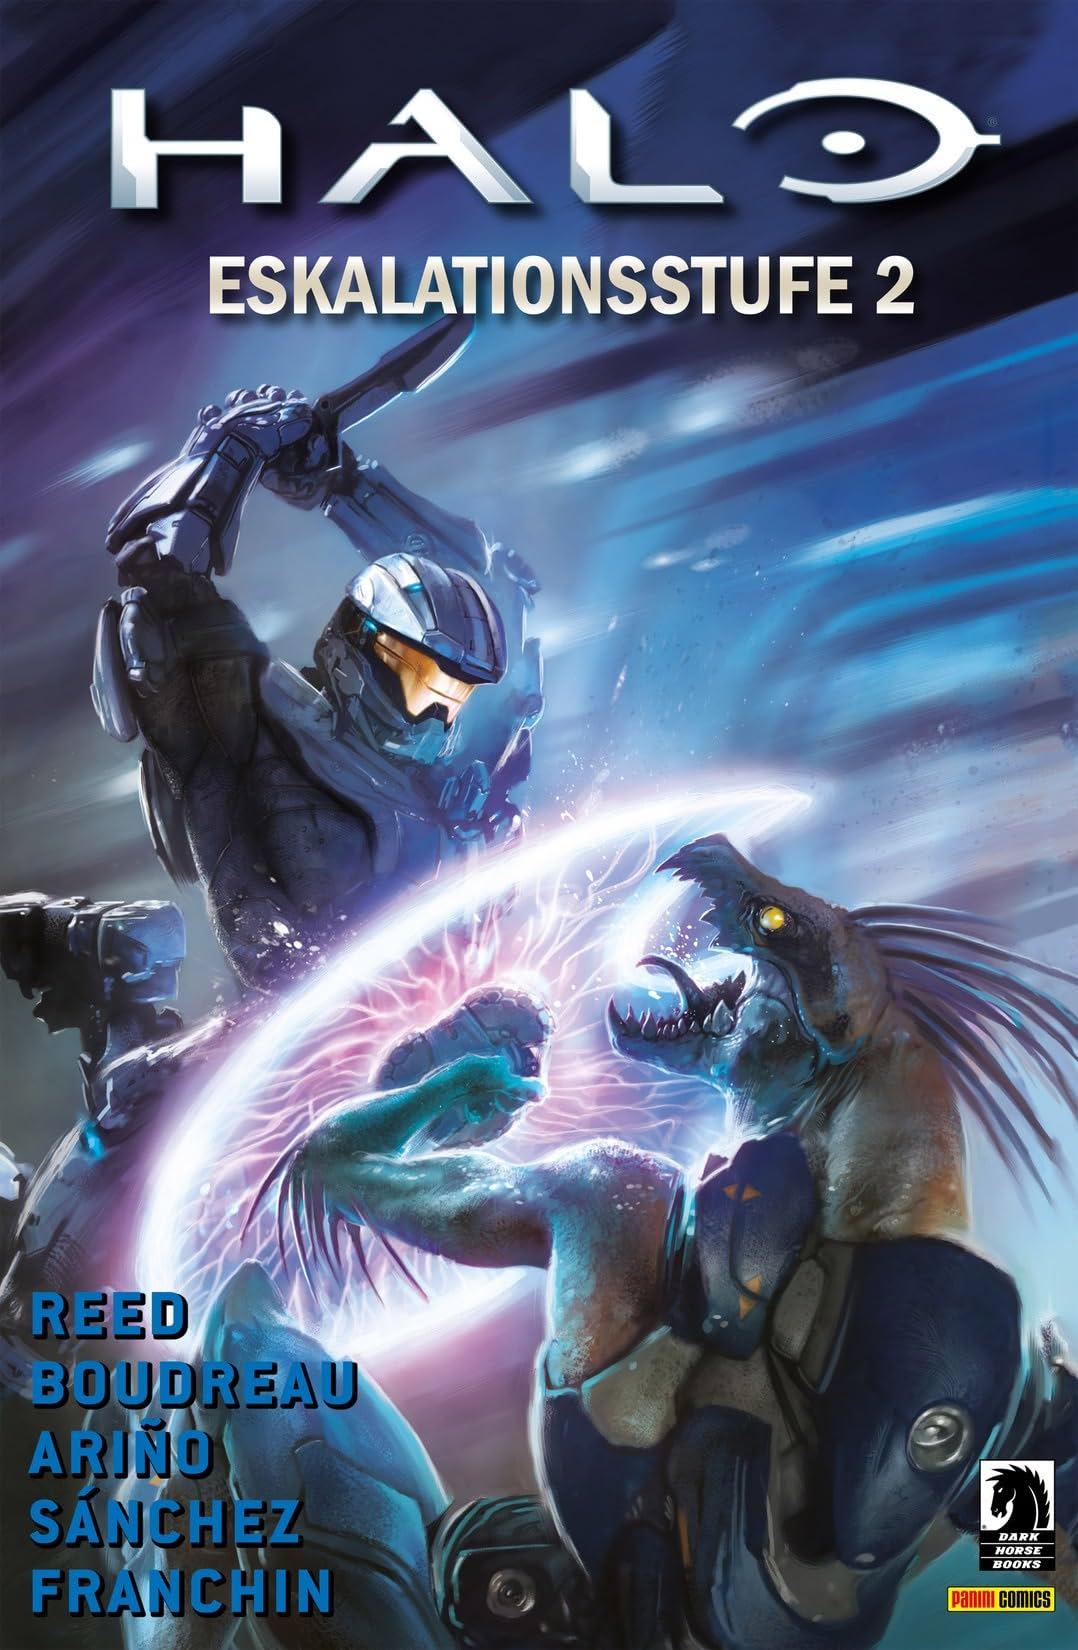 HALO Vol. 7: Eskalationsstufe 2